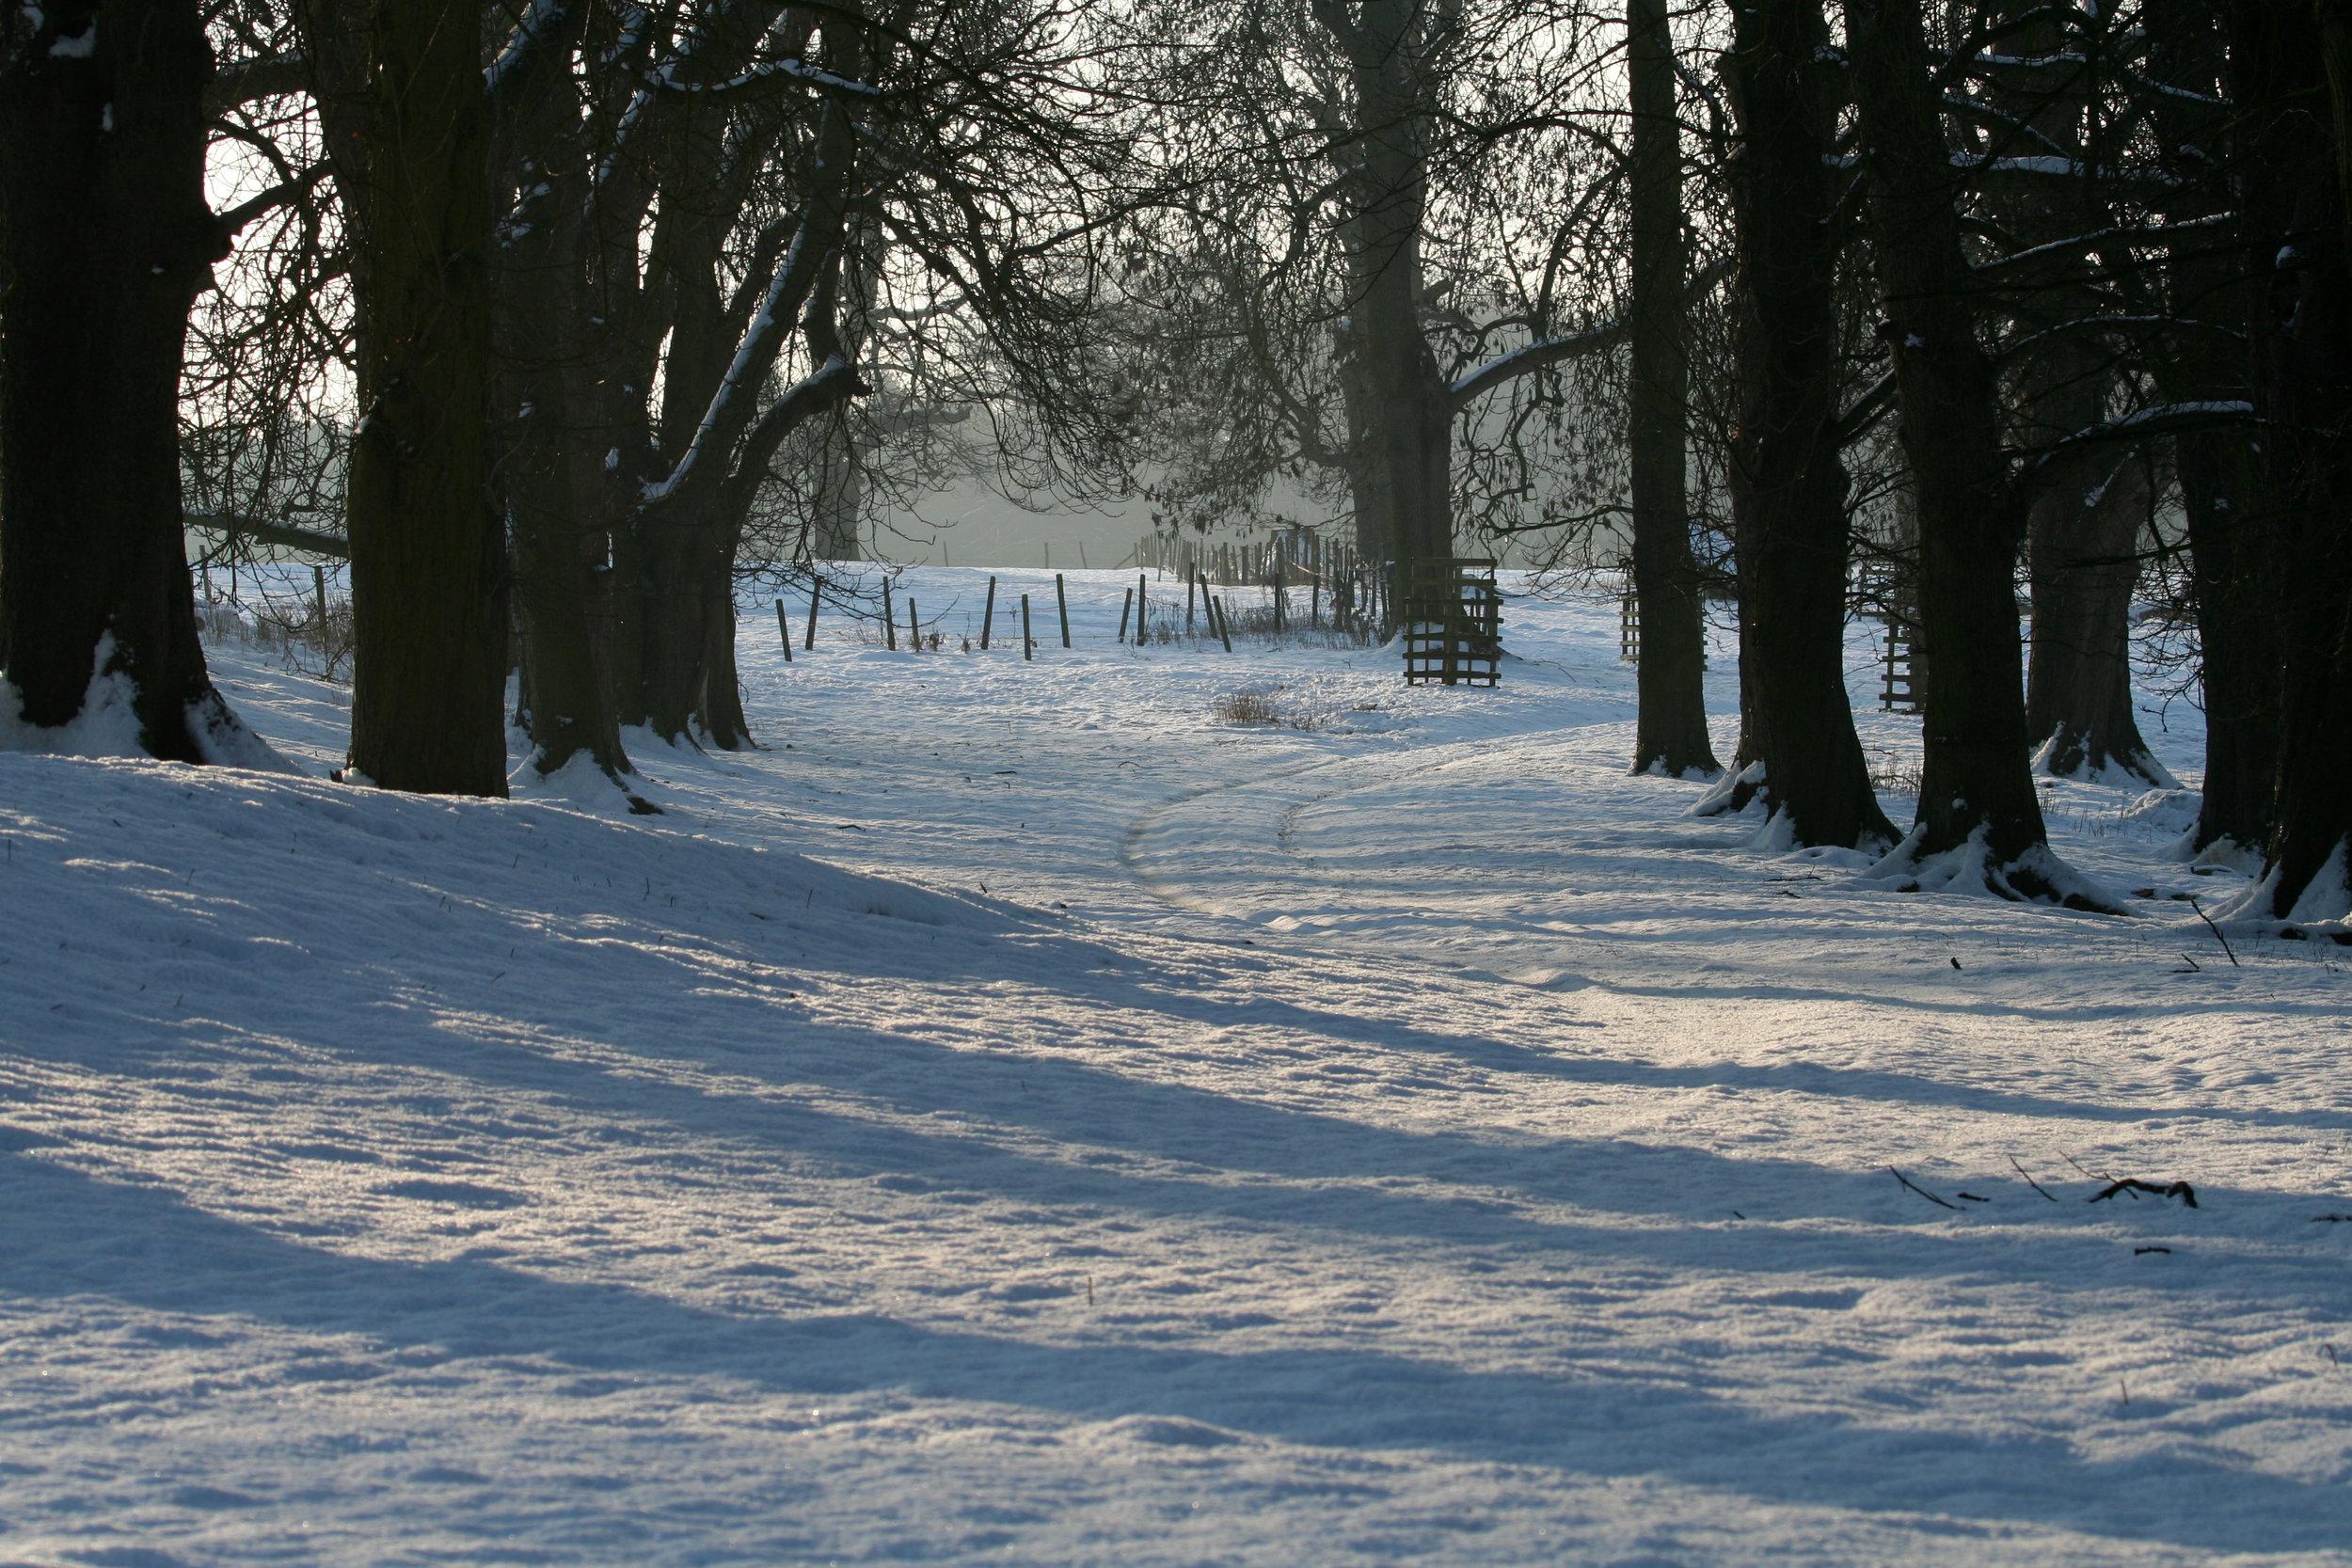 Winter in Easton Park